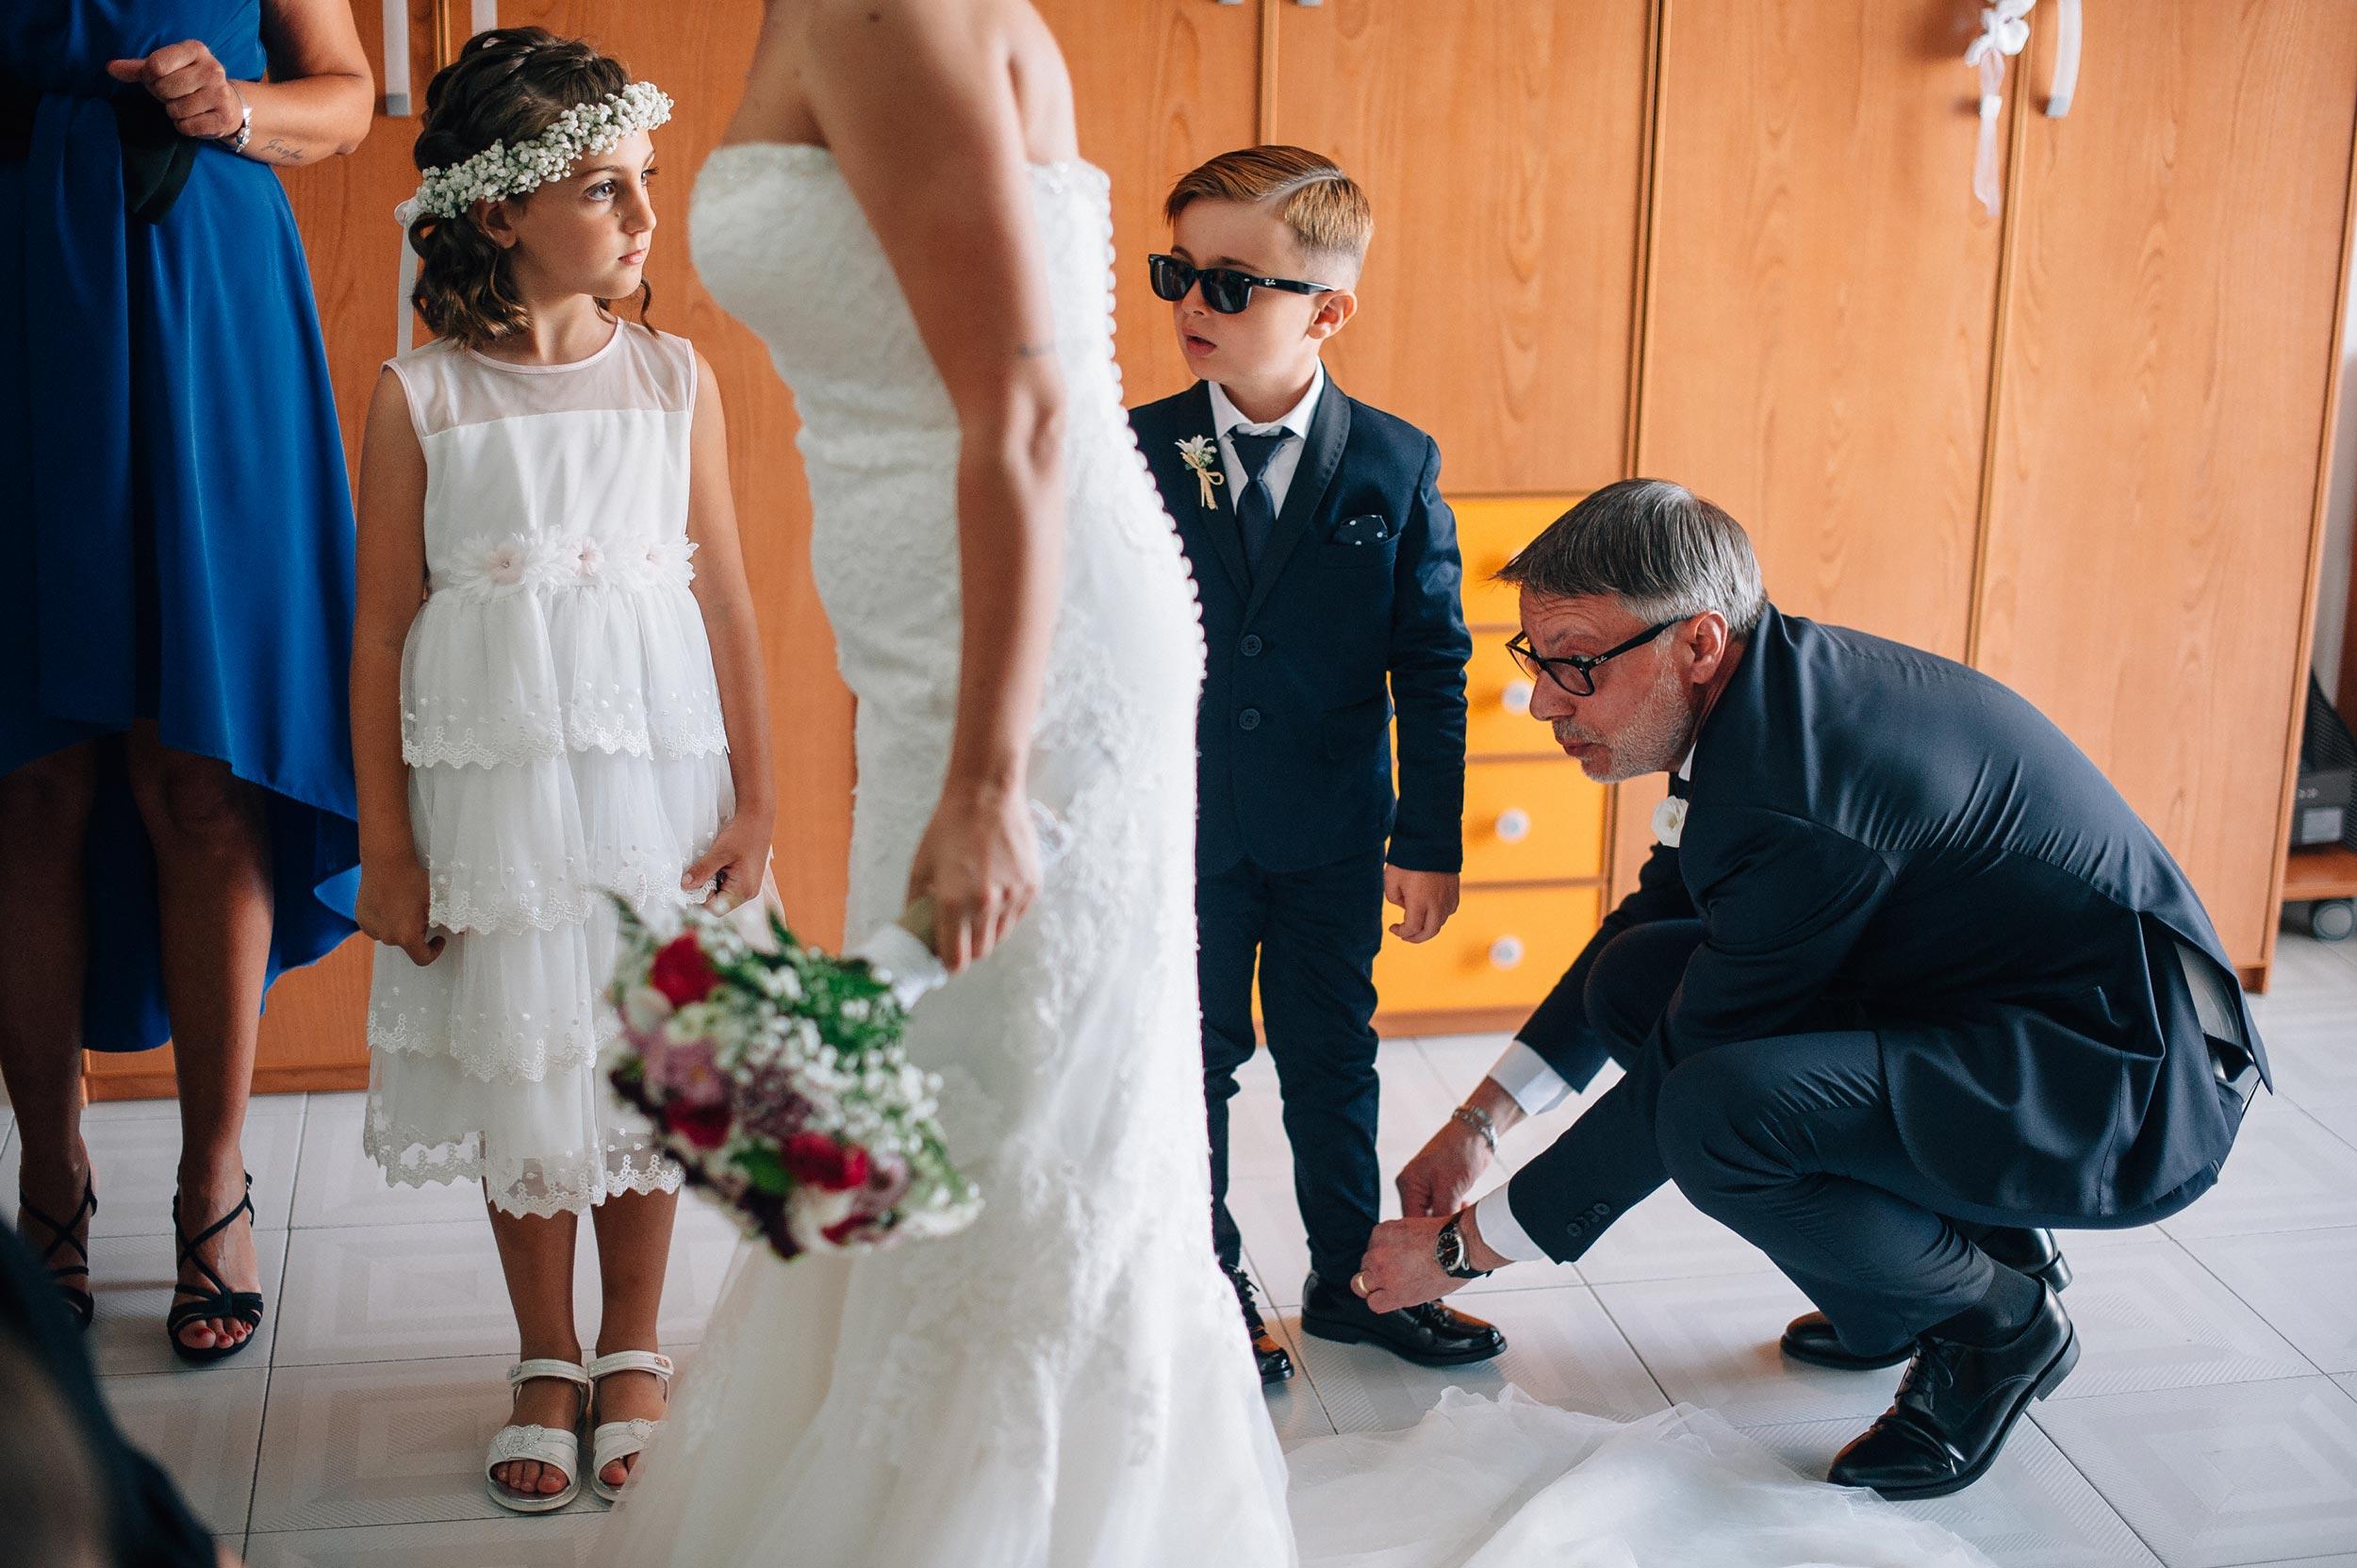 2016-Claudio-Teresa-Naples-Wedding-Photographer-Italy-Alessandro-Avenali-31.jpg